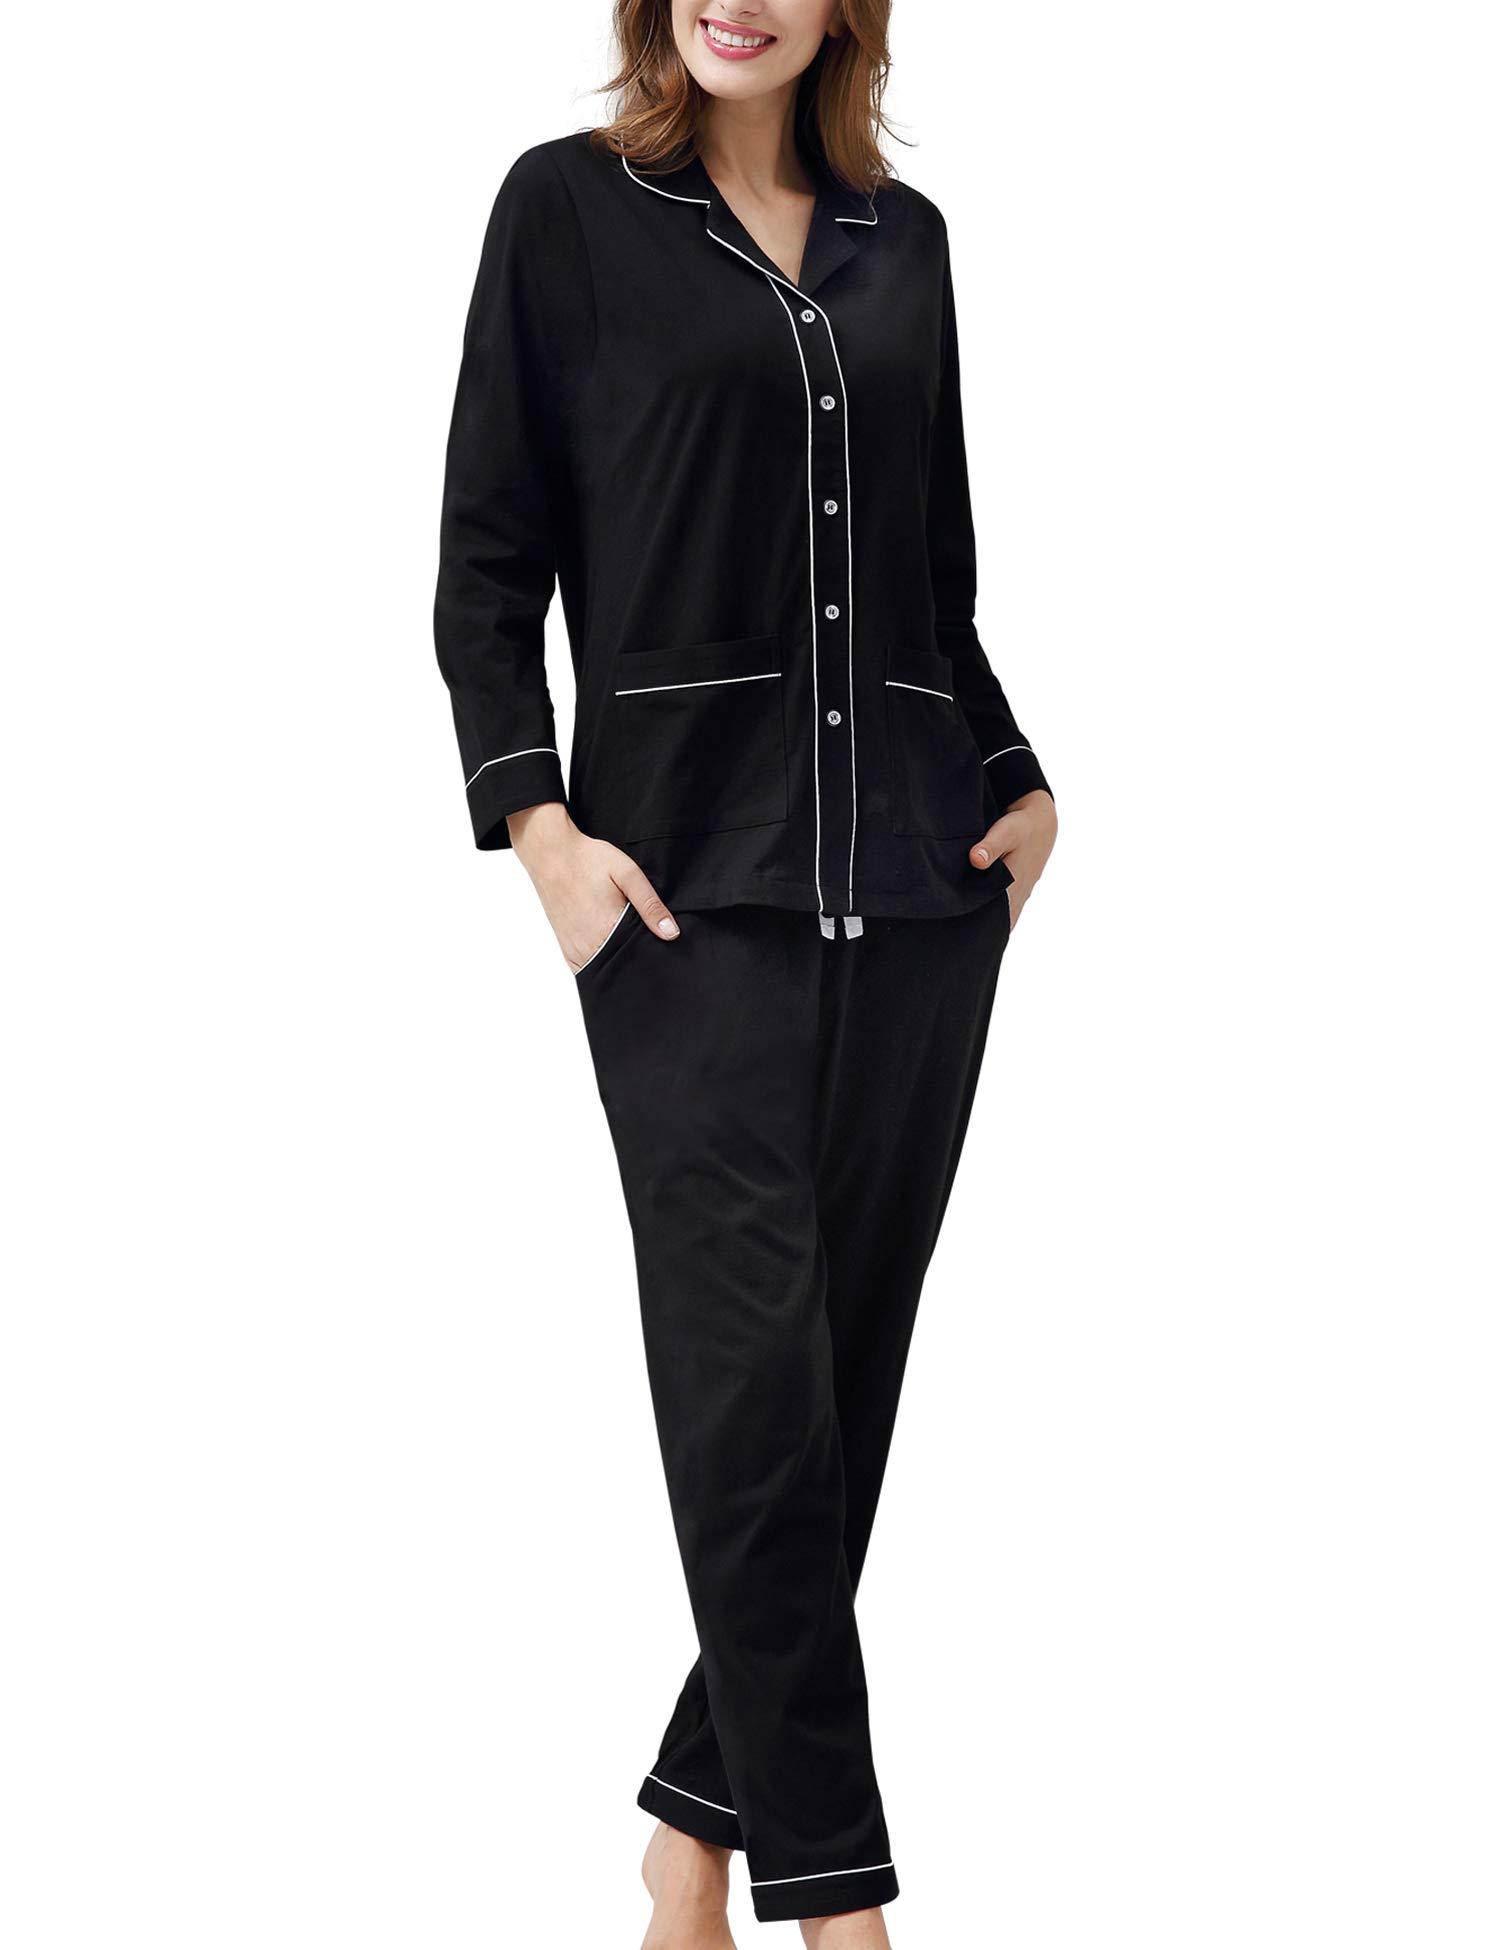 COLORFULLEAF Women 100% Cotton Knit Pajamas Set Button Down PJ Top & Lounge Pants with Pockets